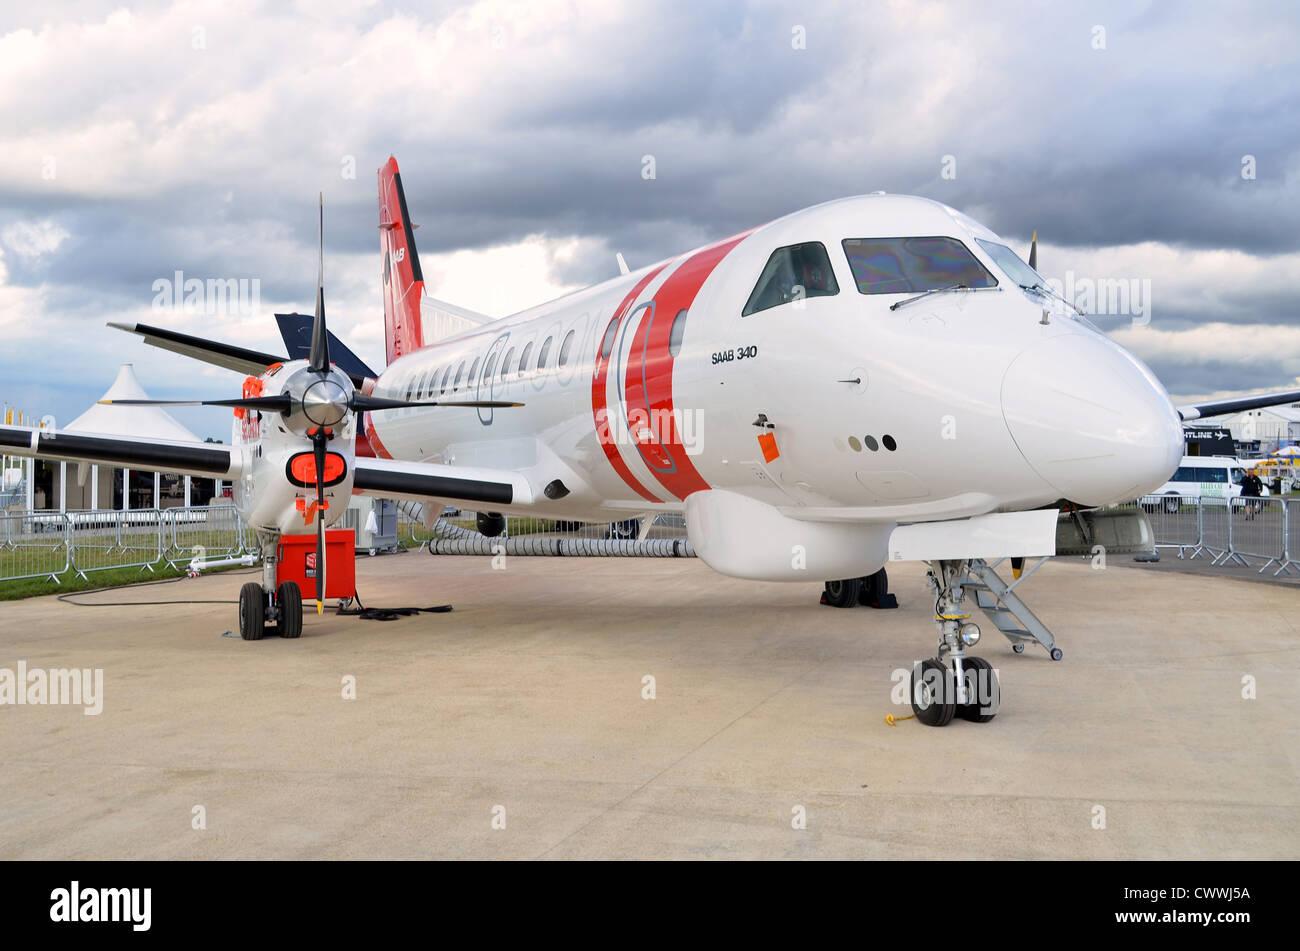 SAAB 340B/Plus maritime patrol aircraft on display at Farnborough International Airshow 2012 - Stock Image